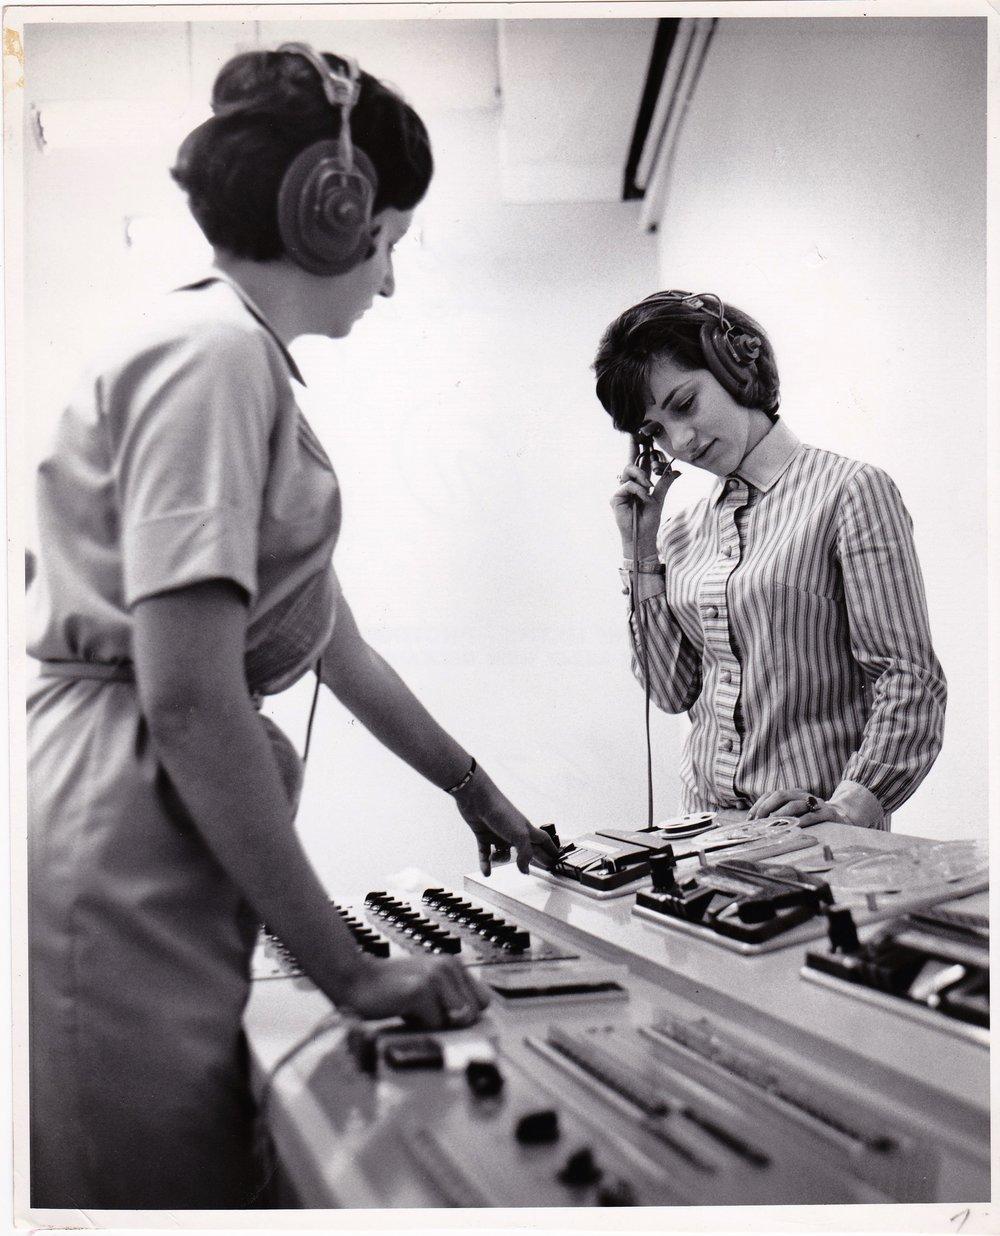 '67 Dolly Brien and Carolyn Ory